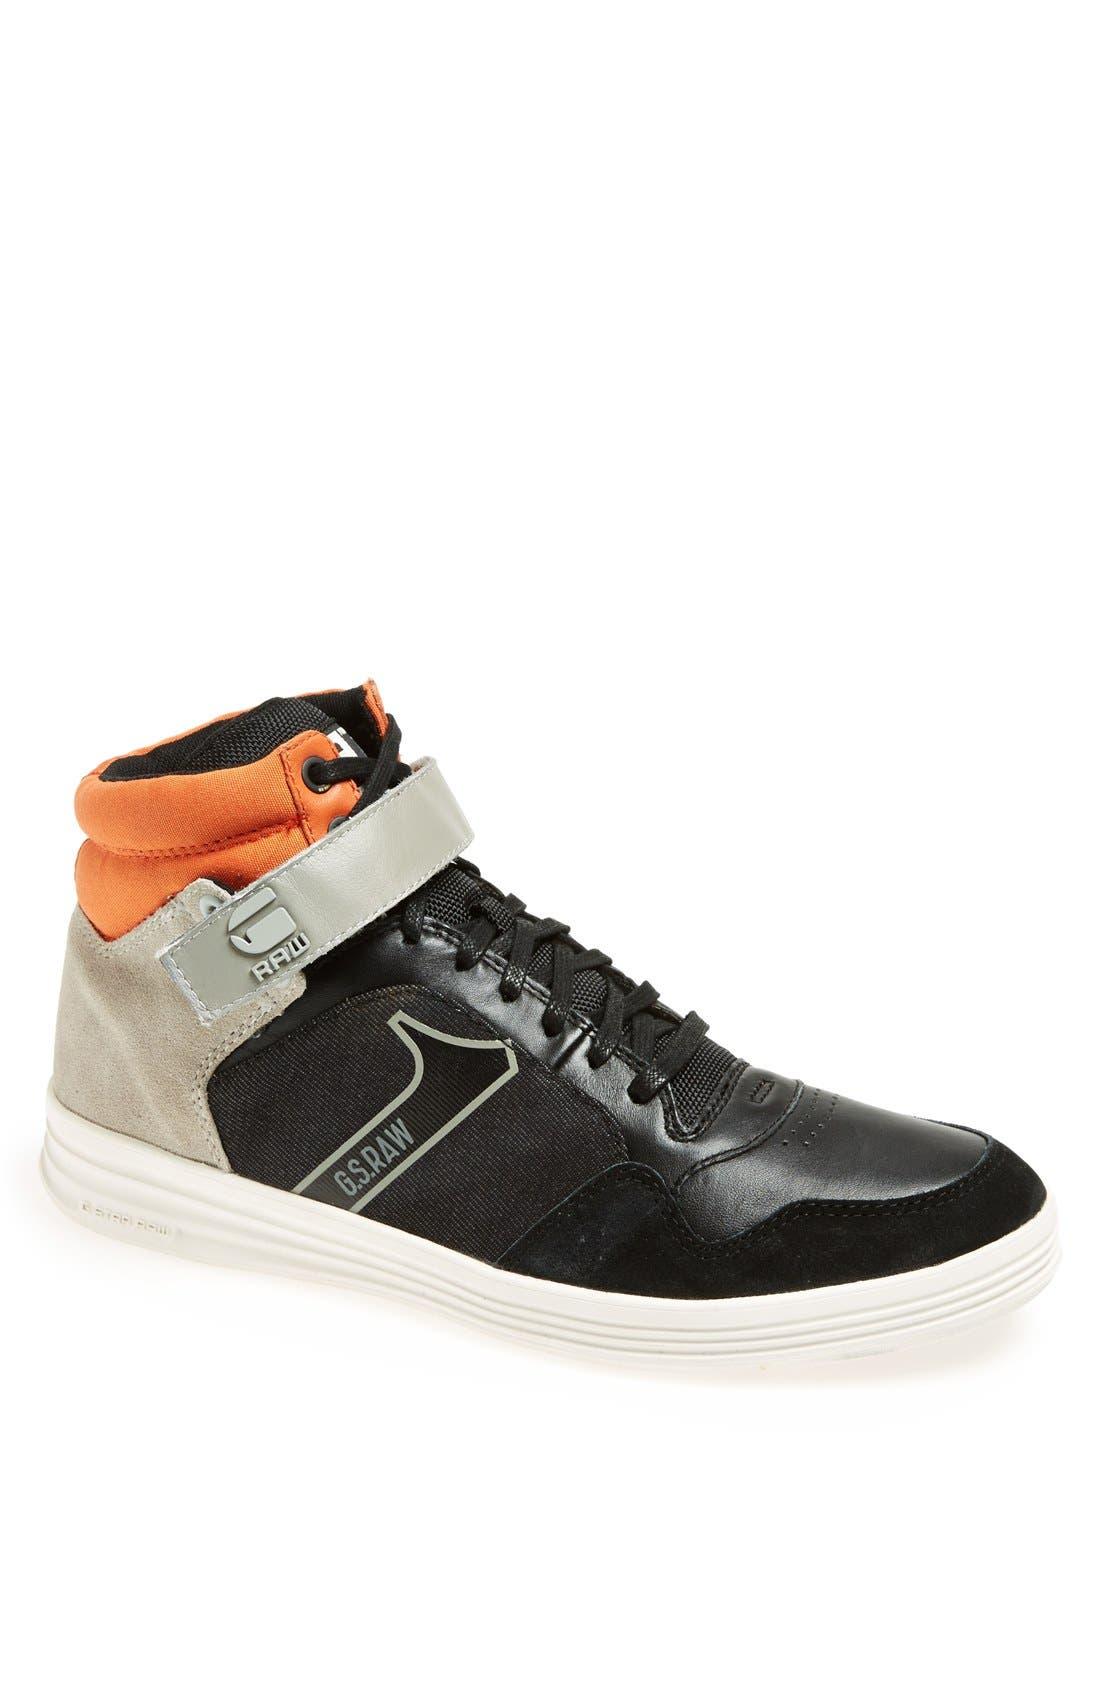 Main Image - G-Star Raw 'Futura Outland' Sneaker